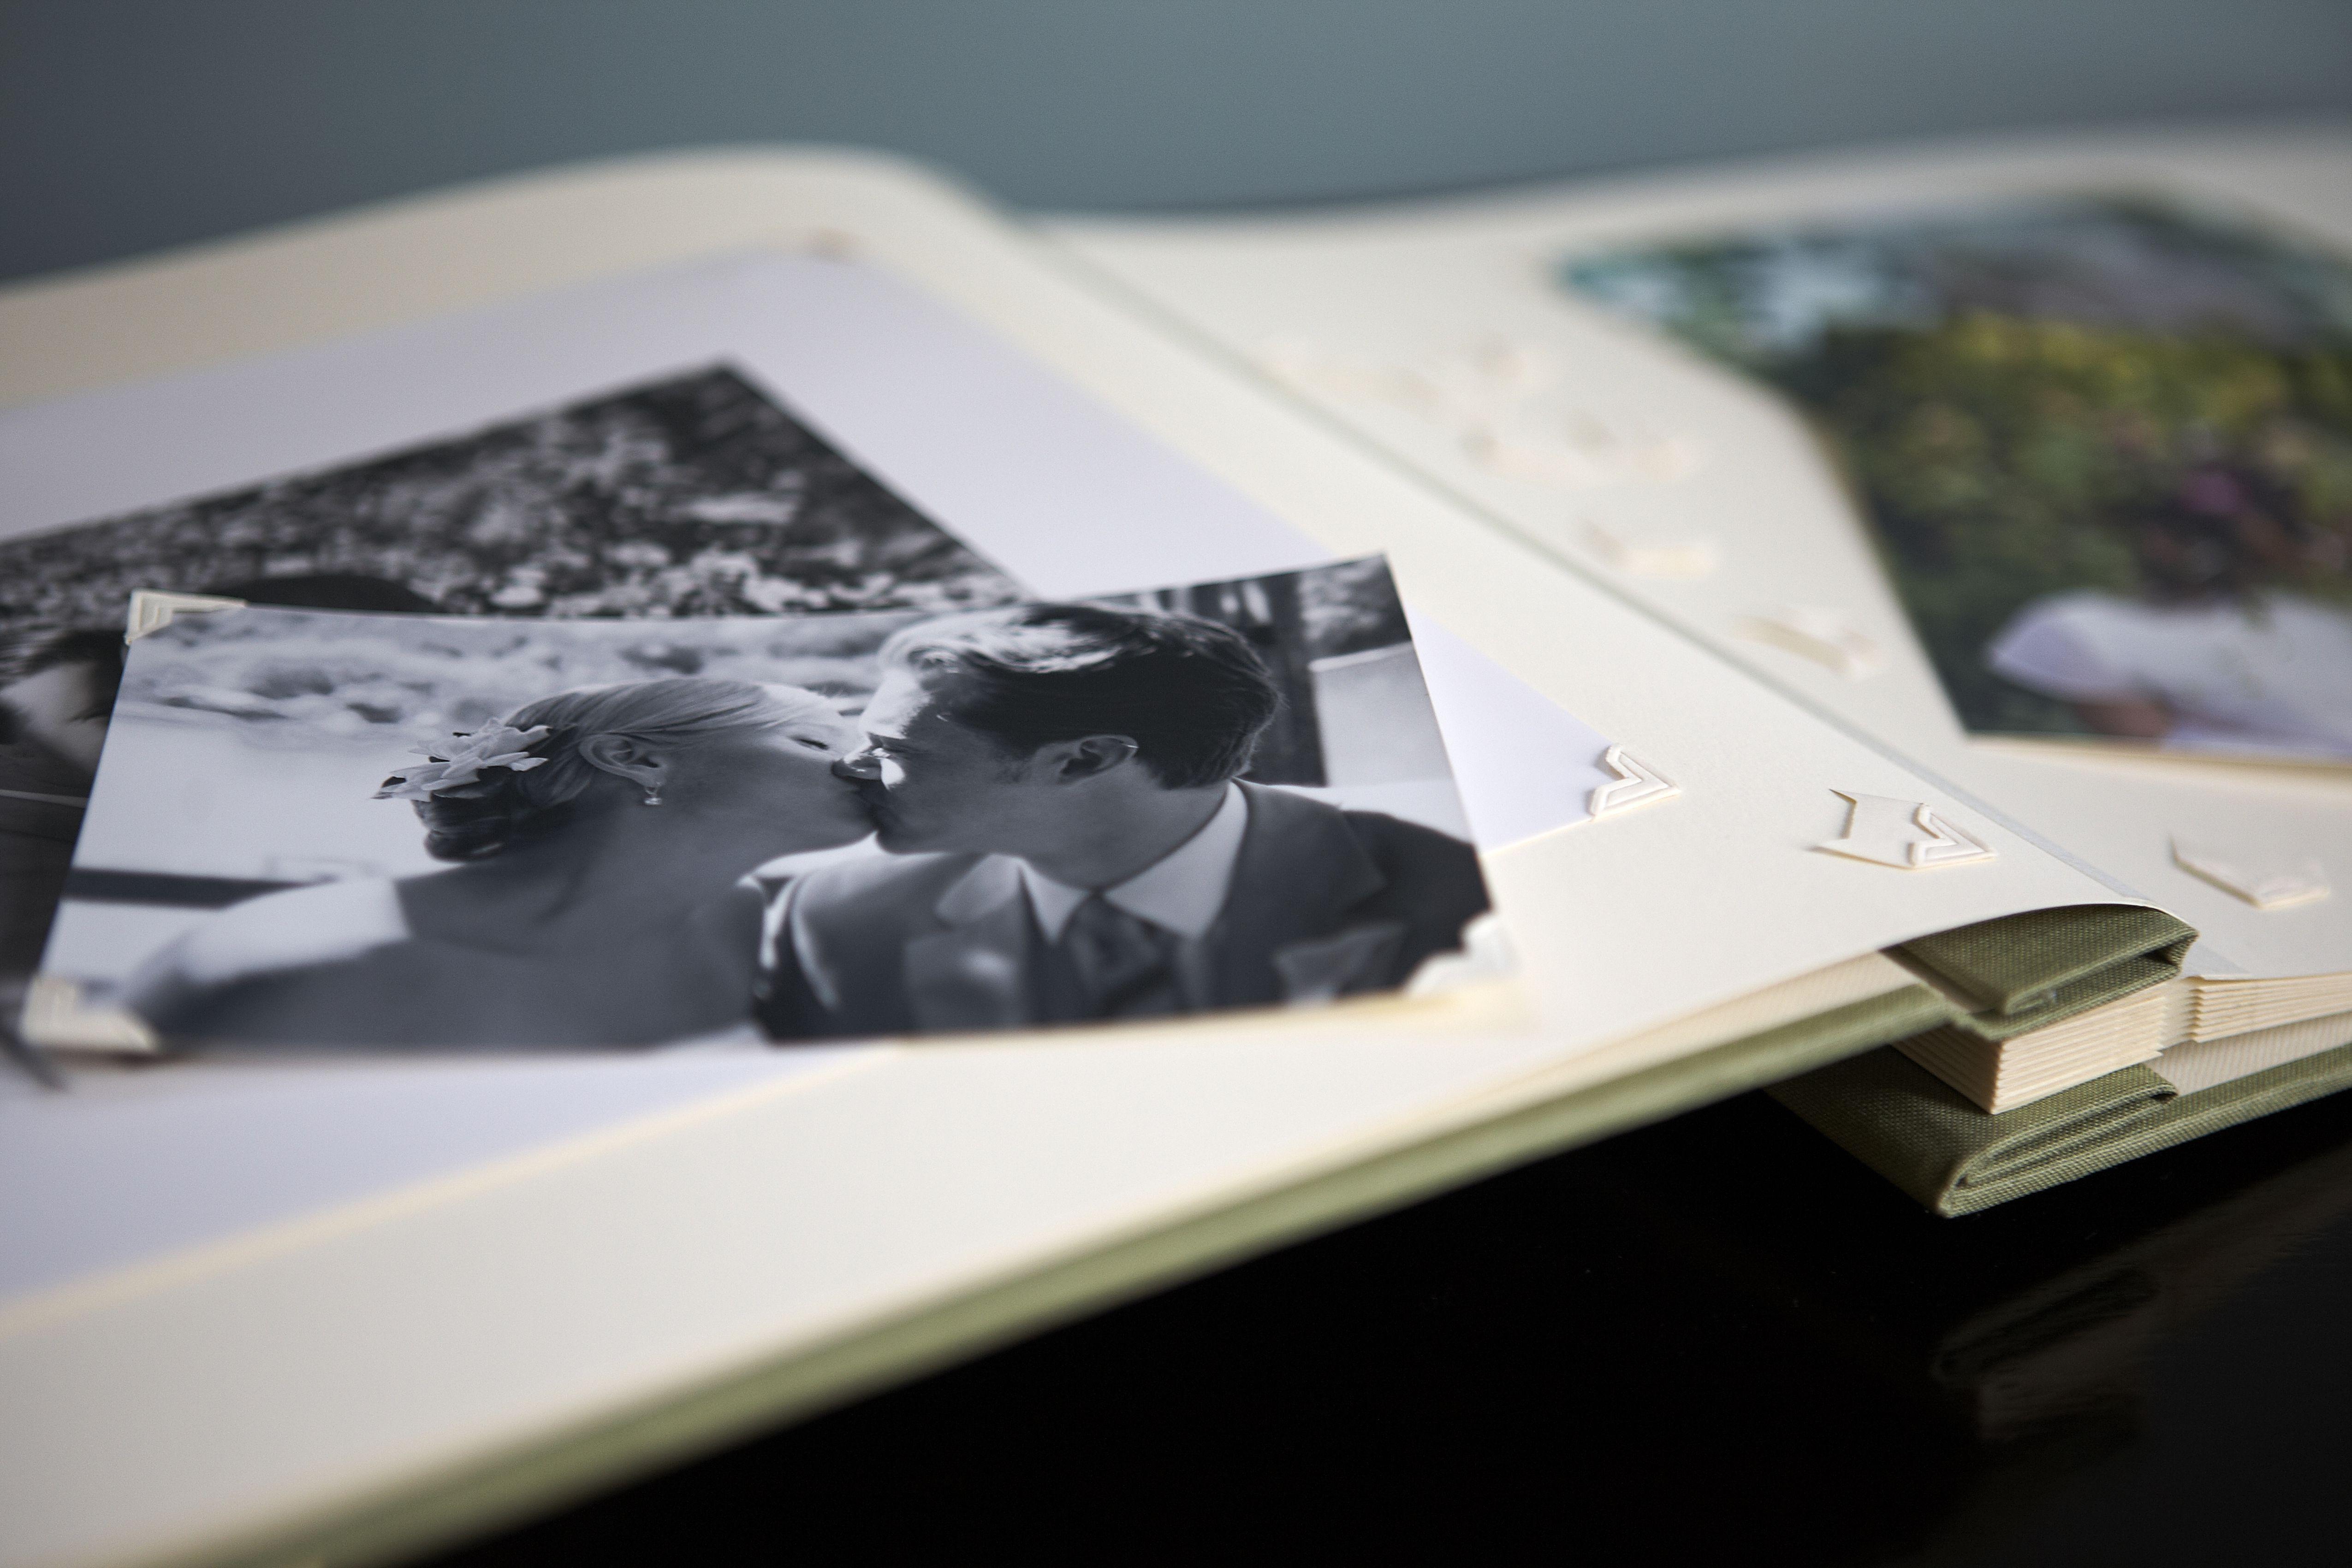 First Anniversary Gift Ideas: Wedding photo album and scrap book